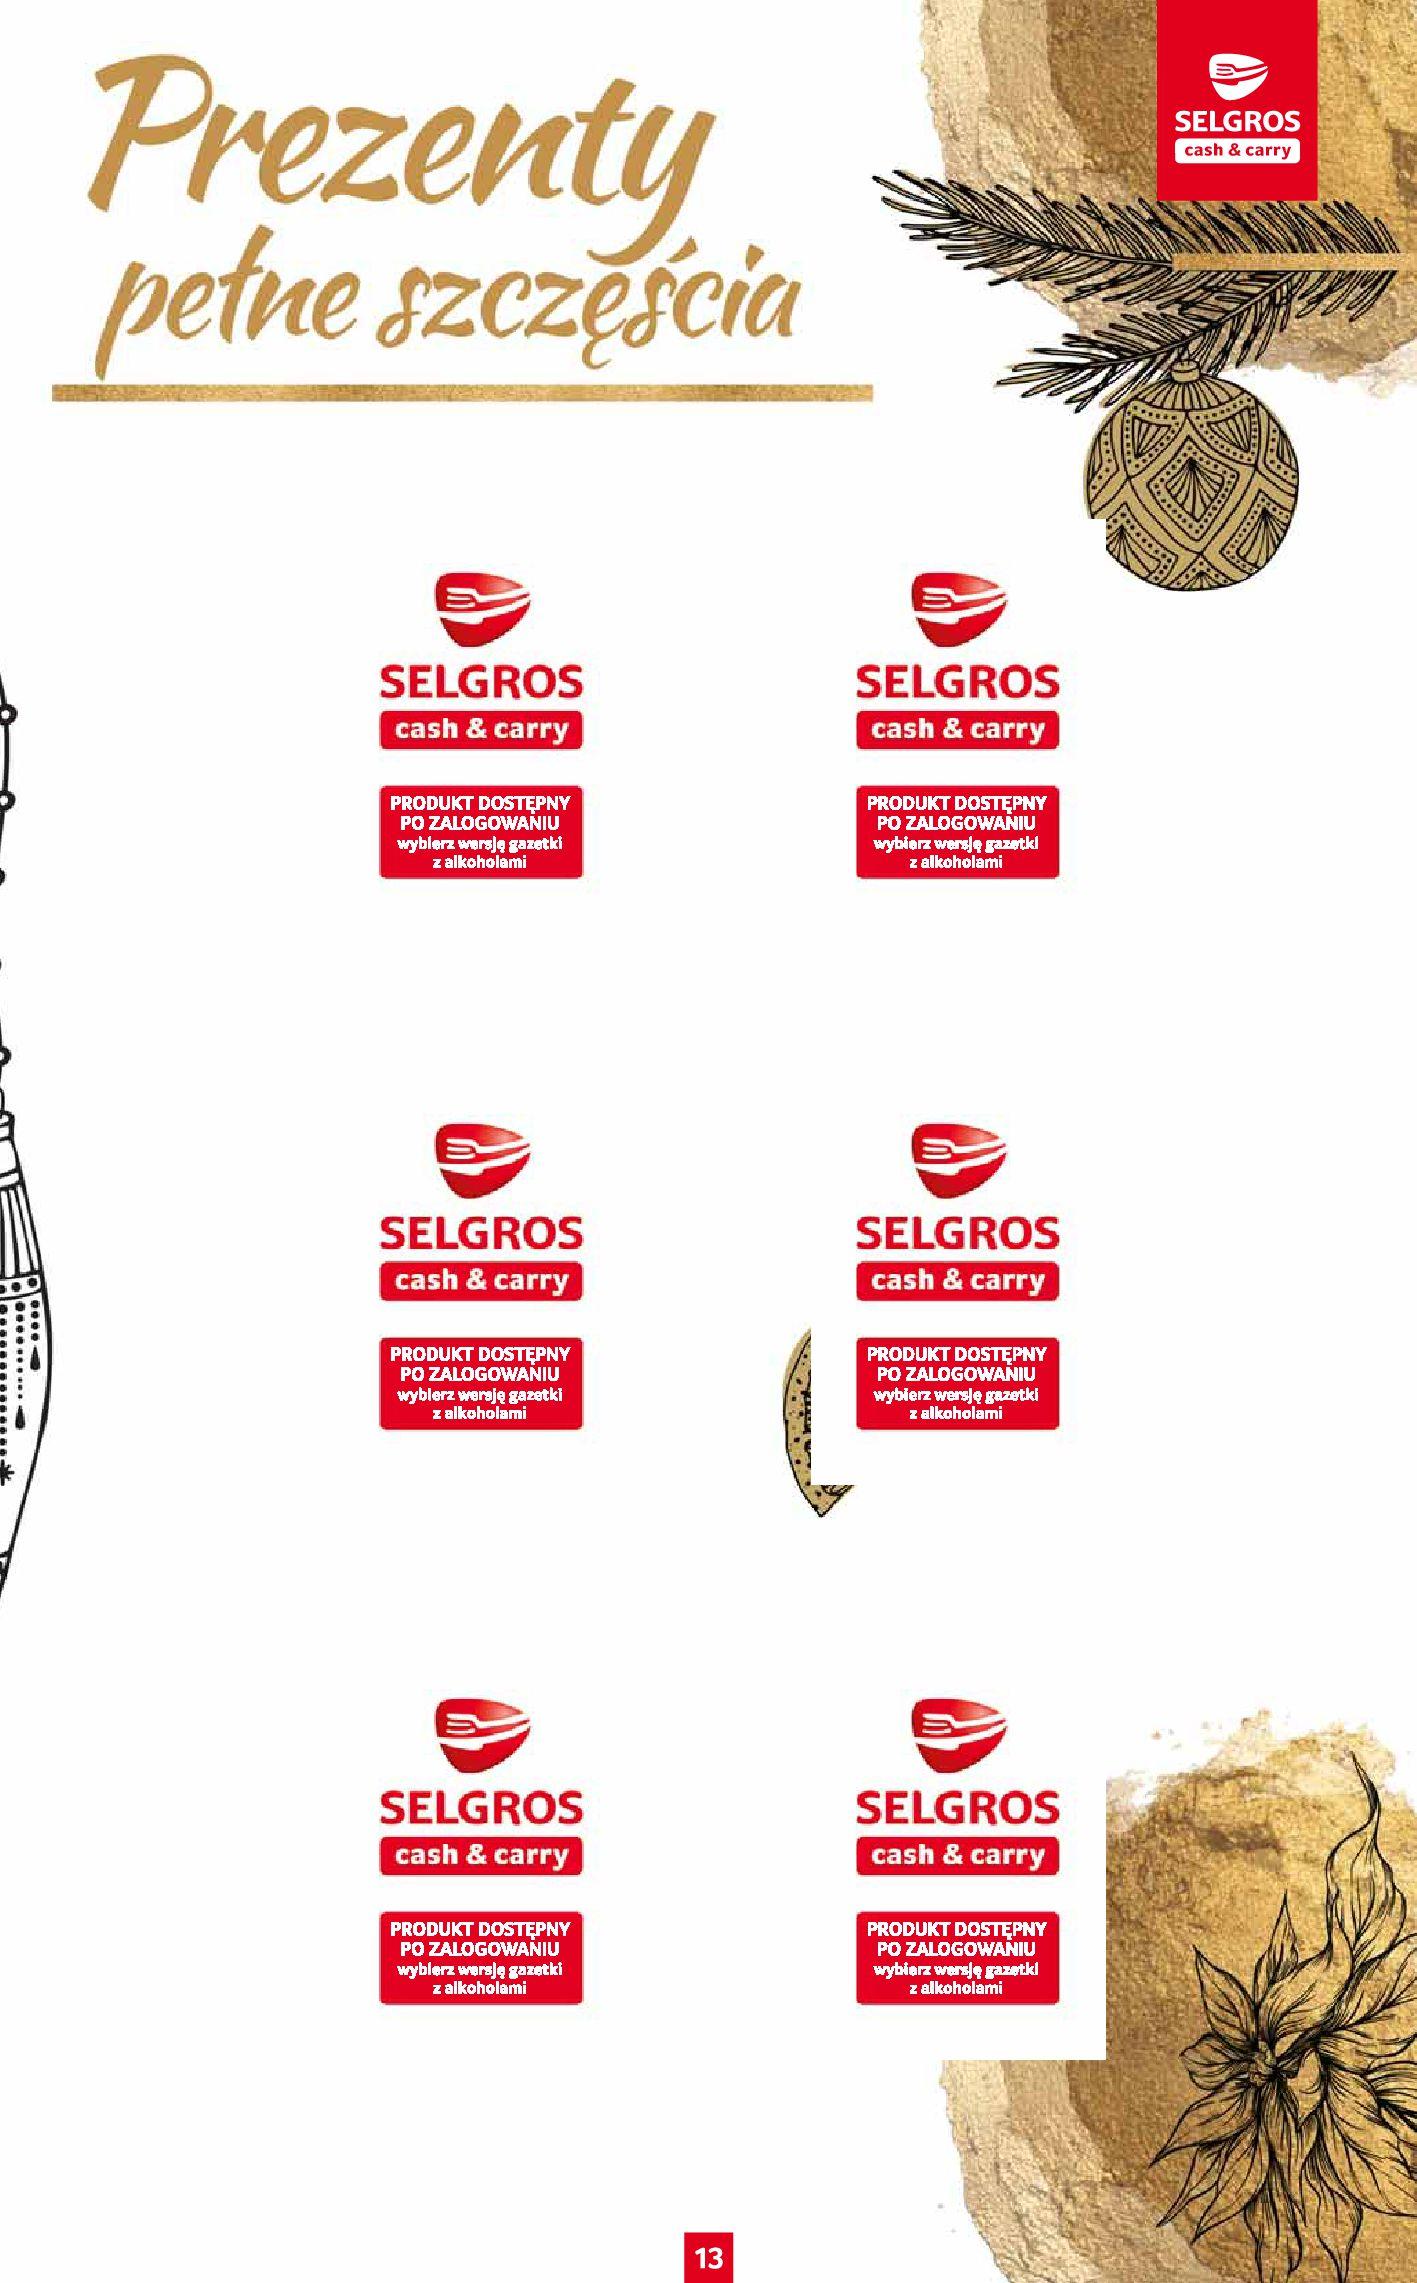 Gazetka Selgros: Katalog Prezenty 2020-11-19 page-13